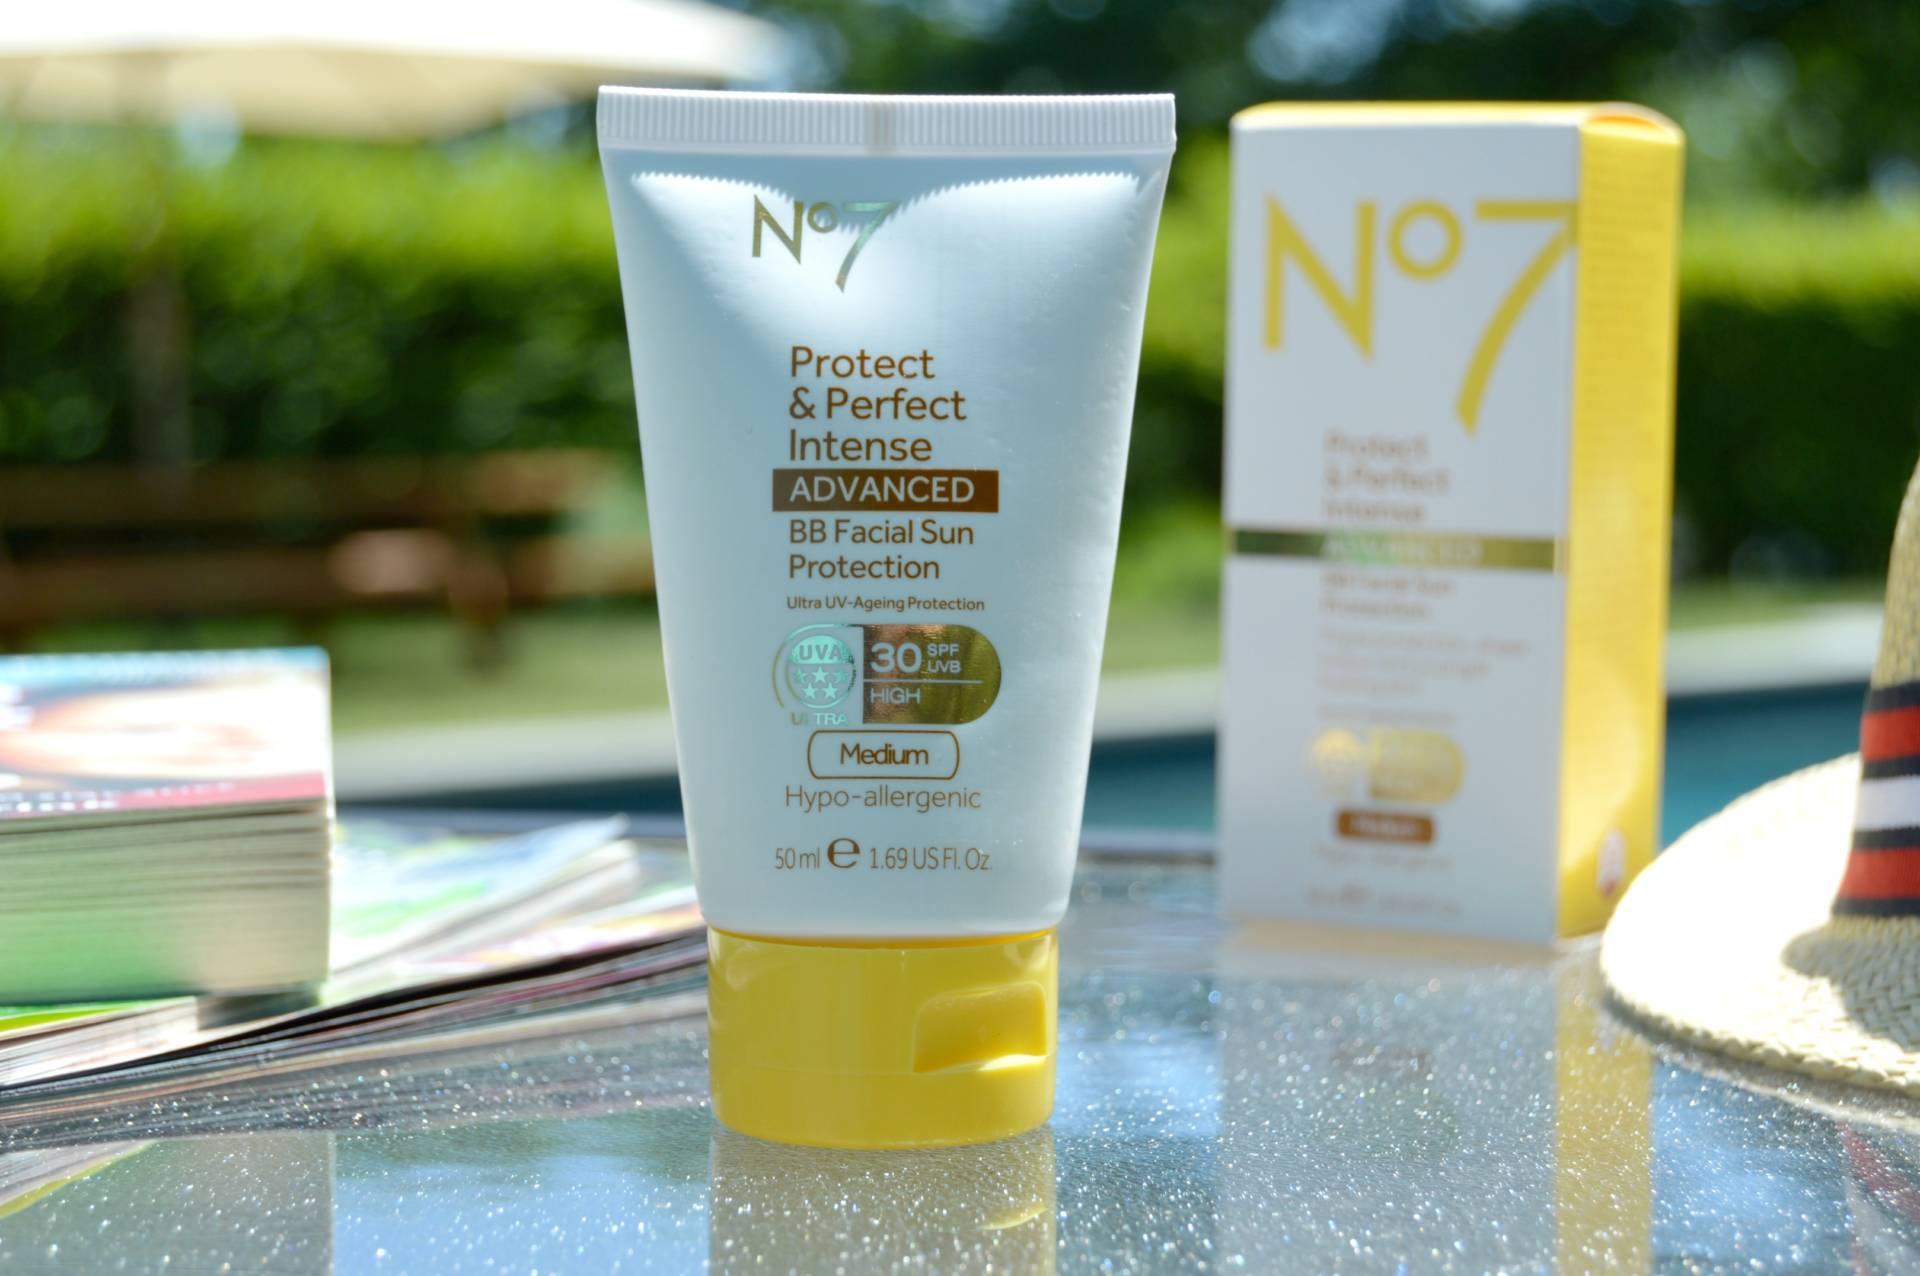 boots no7 protect perfect intense advanced bb facial sun protection medium review inhautepursuit